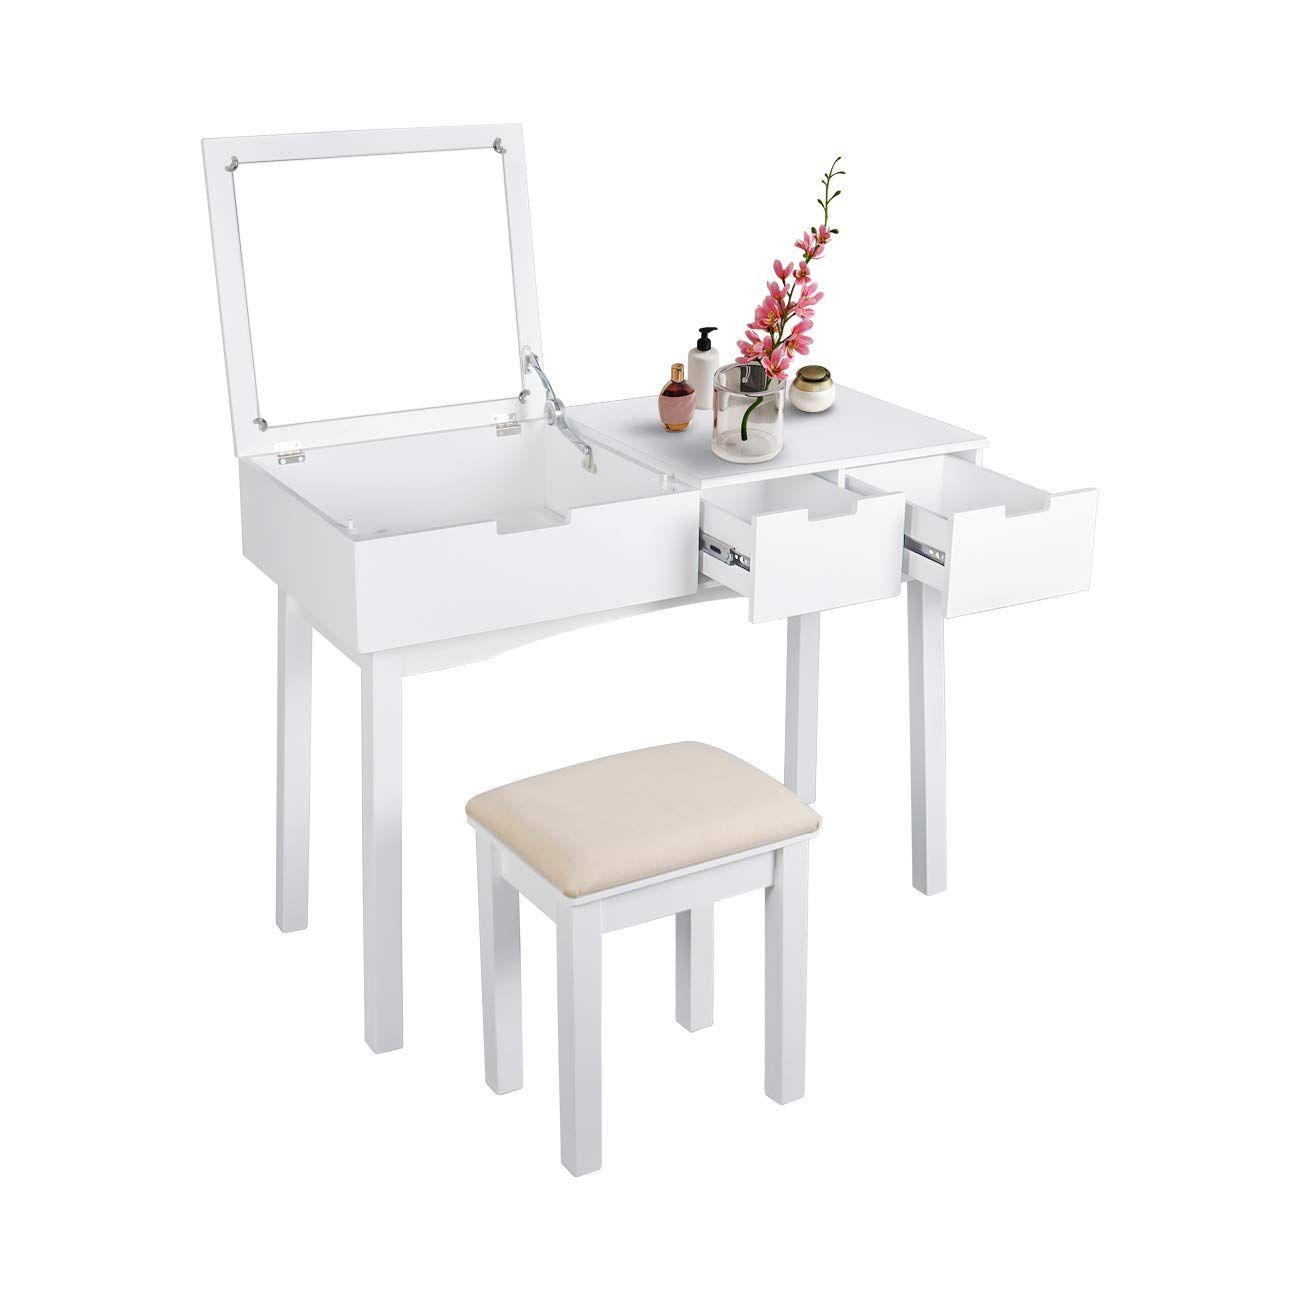 Vanity Table Set Makeup Flip-top Mirrored Dressing Table w// Stool 2 Drawer White